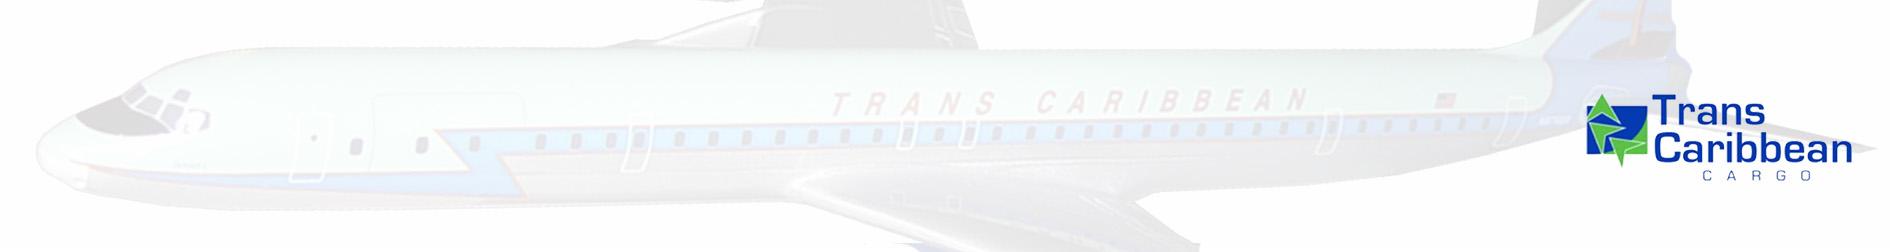 trans-caribbean-1.jpg